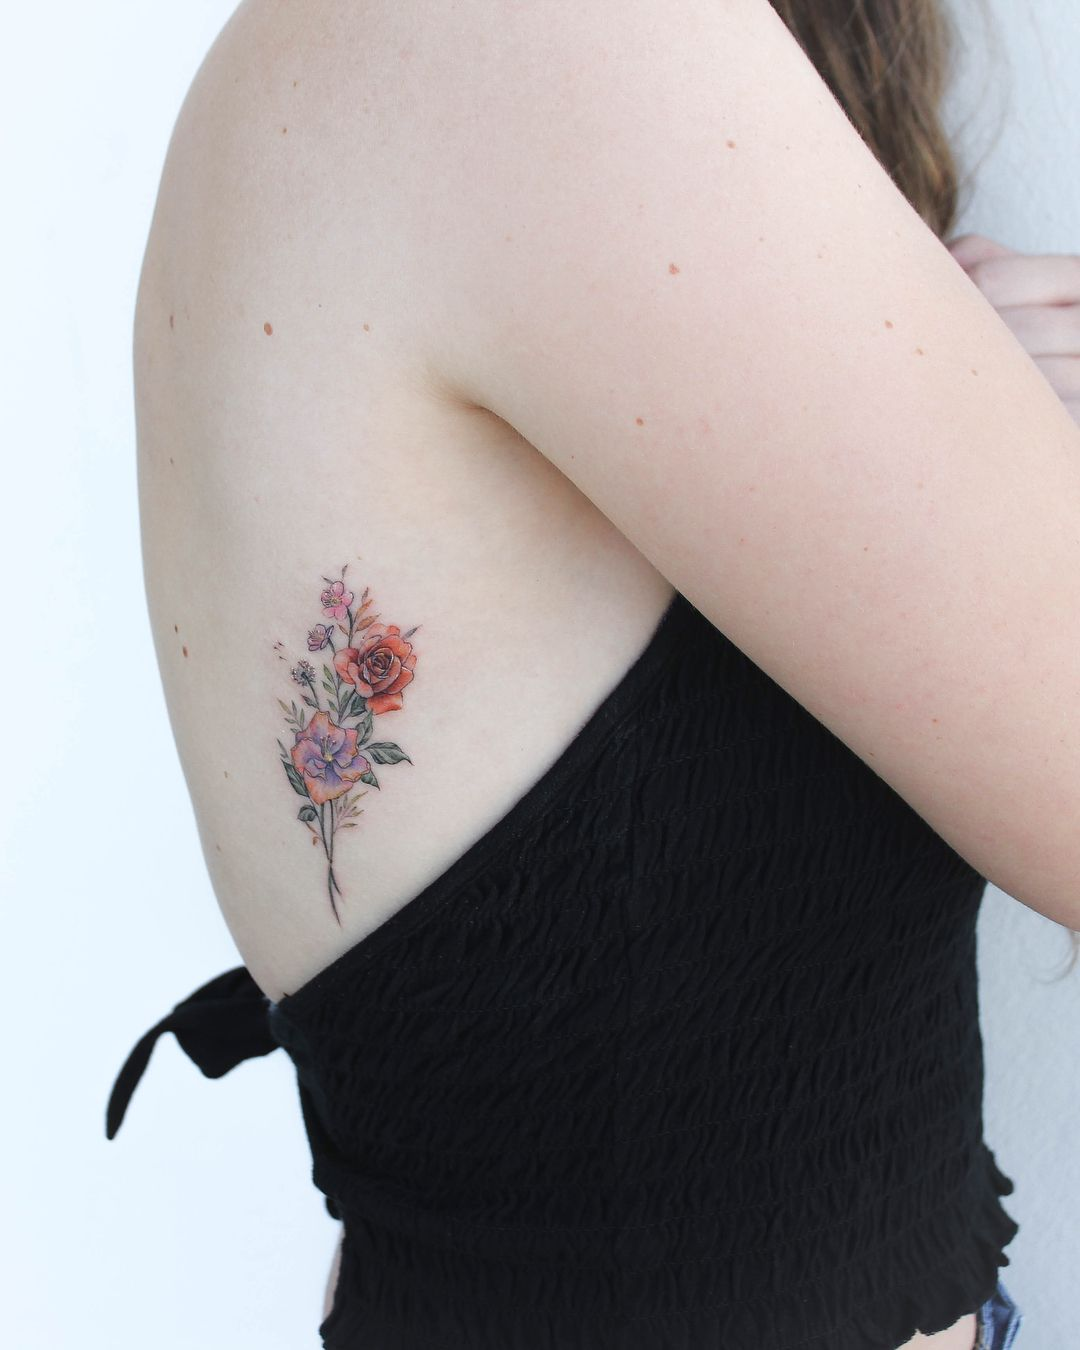 4b1ecfb39 Cute Tattoos for Girls 2019- Lovely Designs with Meaning tattoos,tattoos  for women,tattoos for guys,tattoos for women small,tattoos for women half  sleeve ...